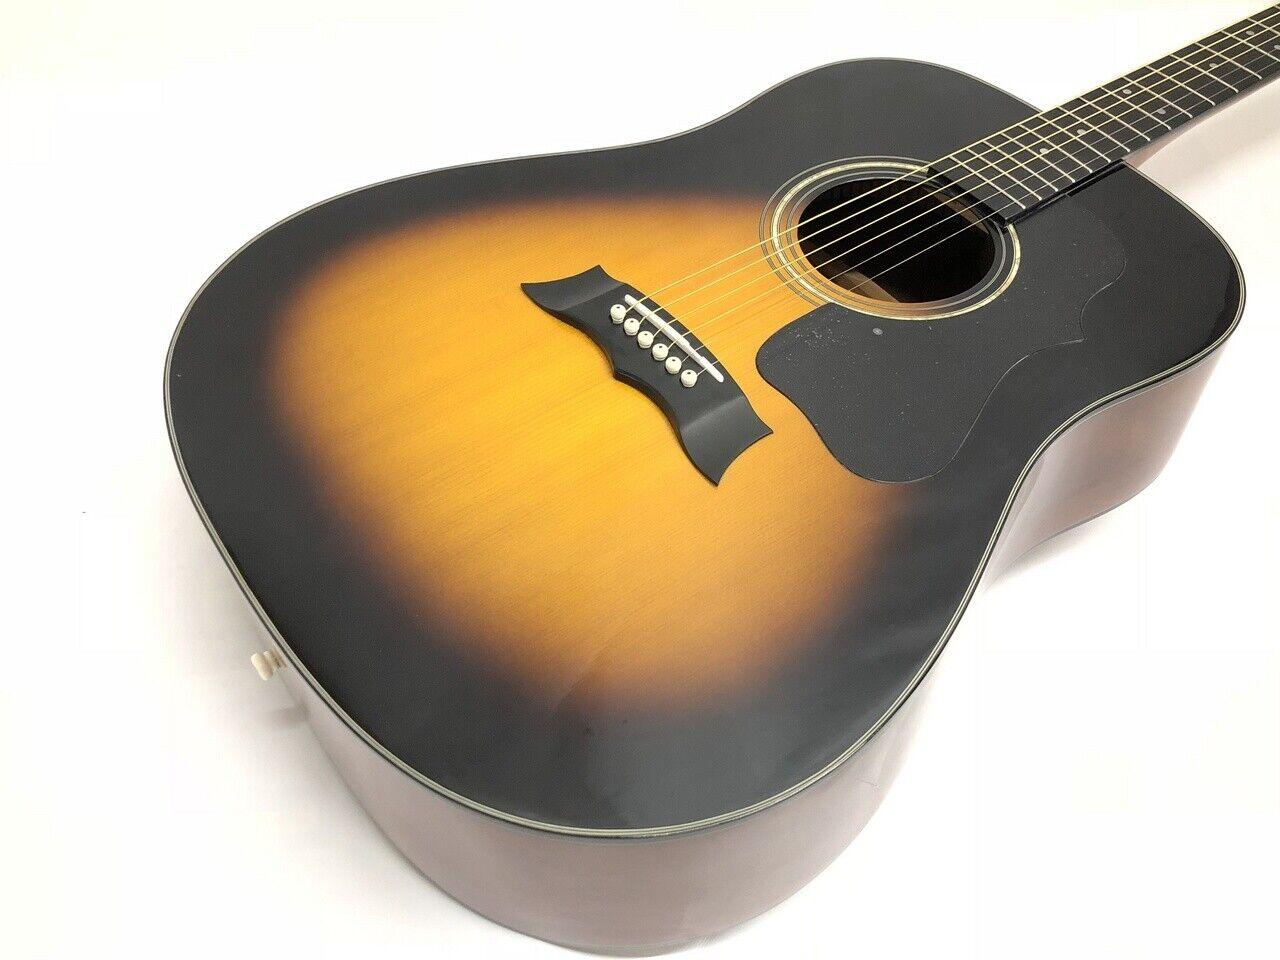 Morris G-01 TS acoustic guitar Japan rare beautiful vintage popular EMS F   S